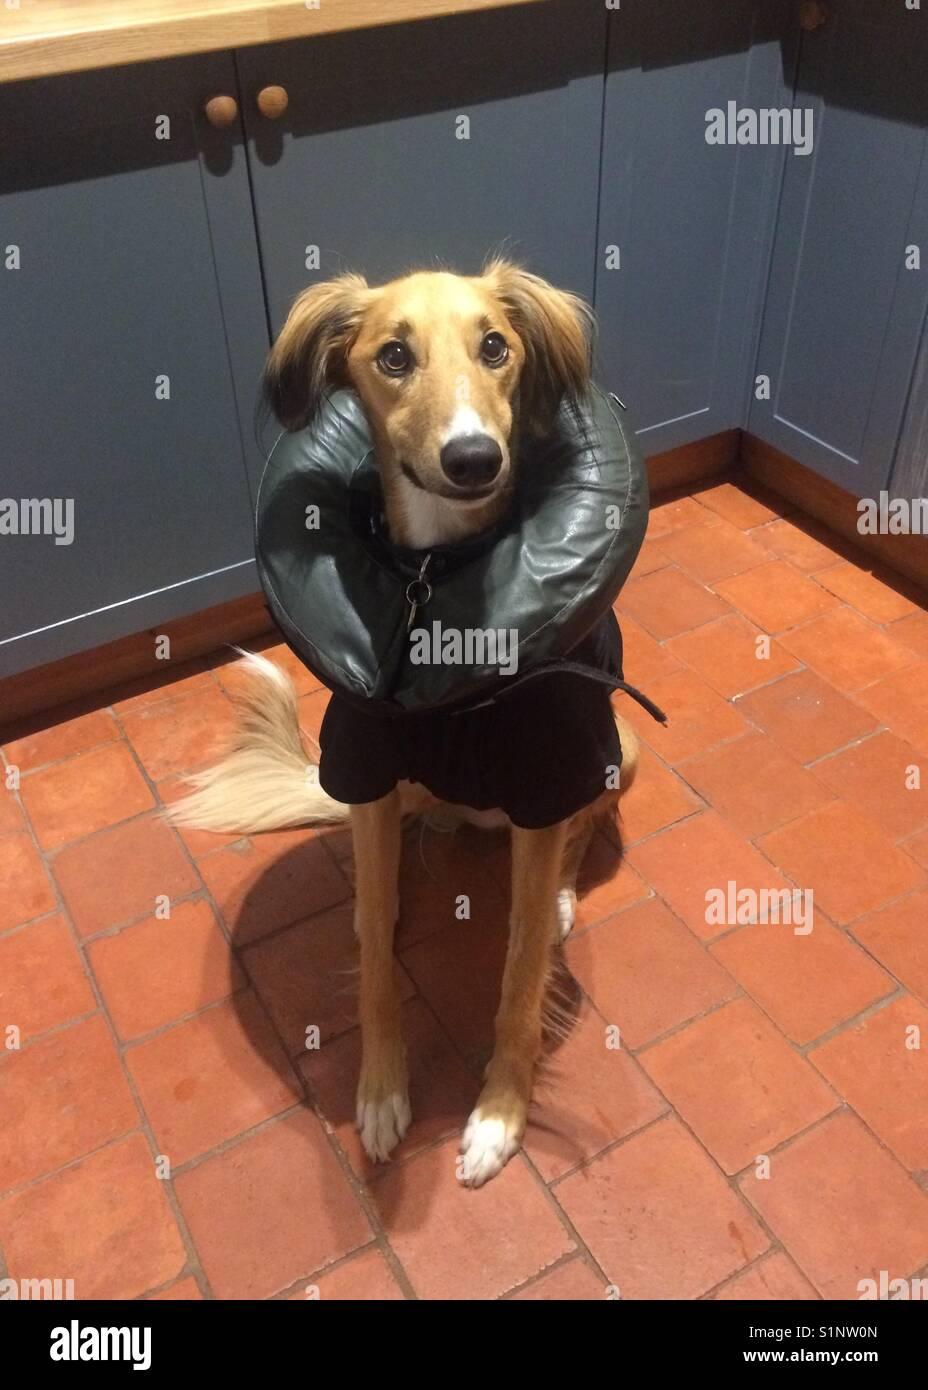 Injured dog wearing inflatable collar Stock Photo